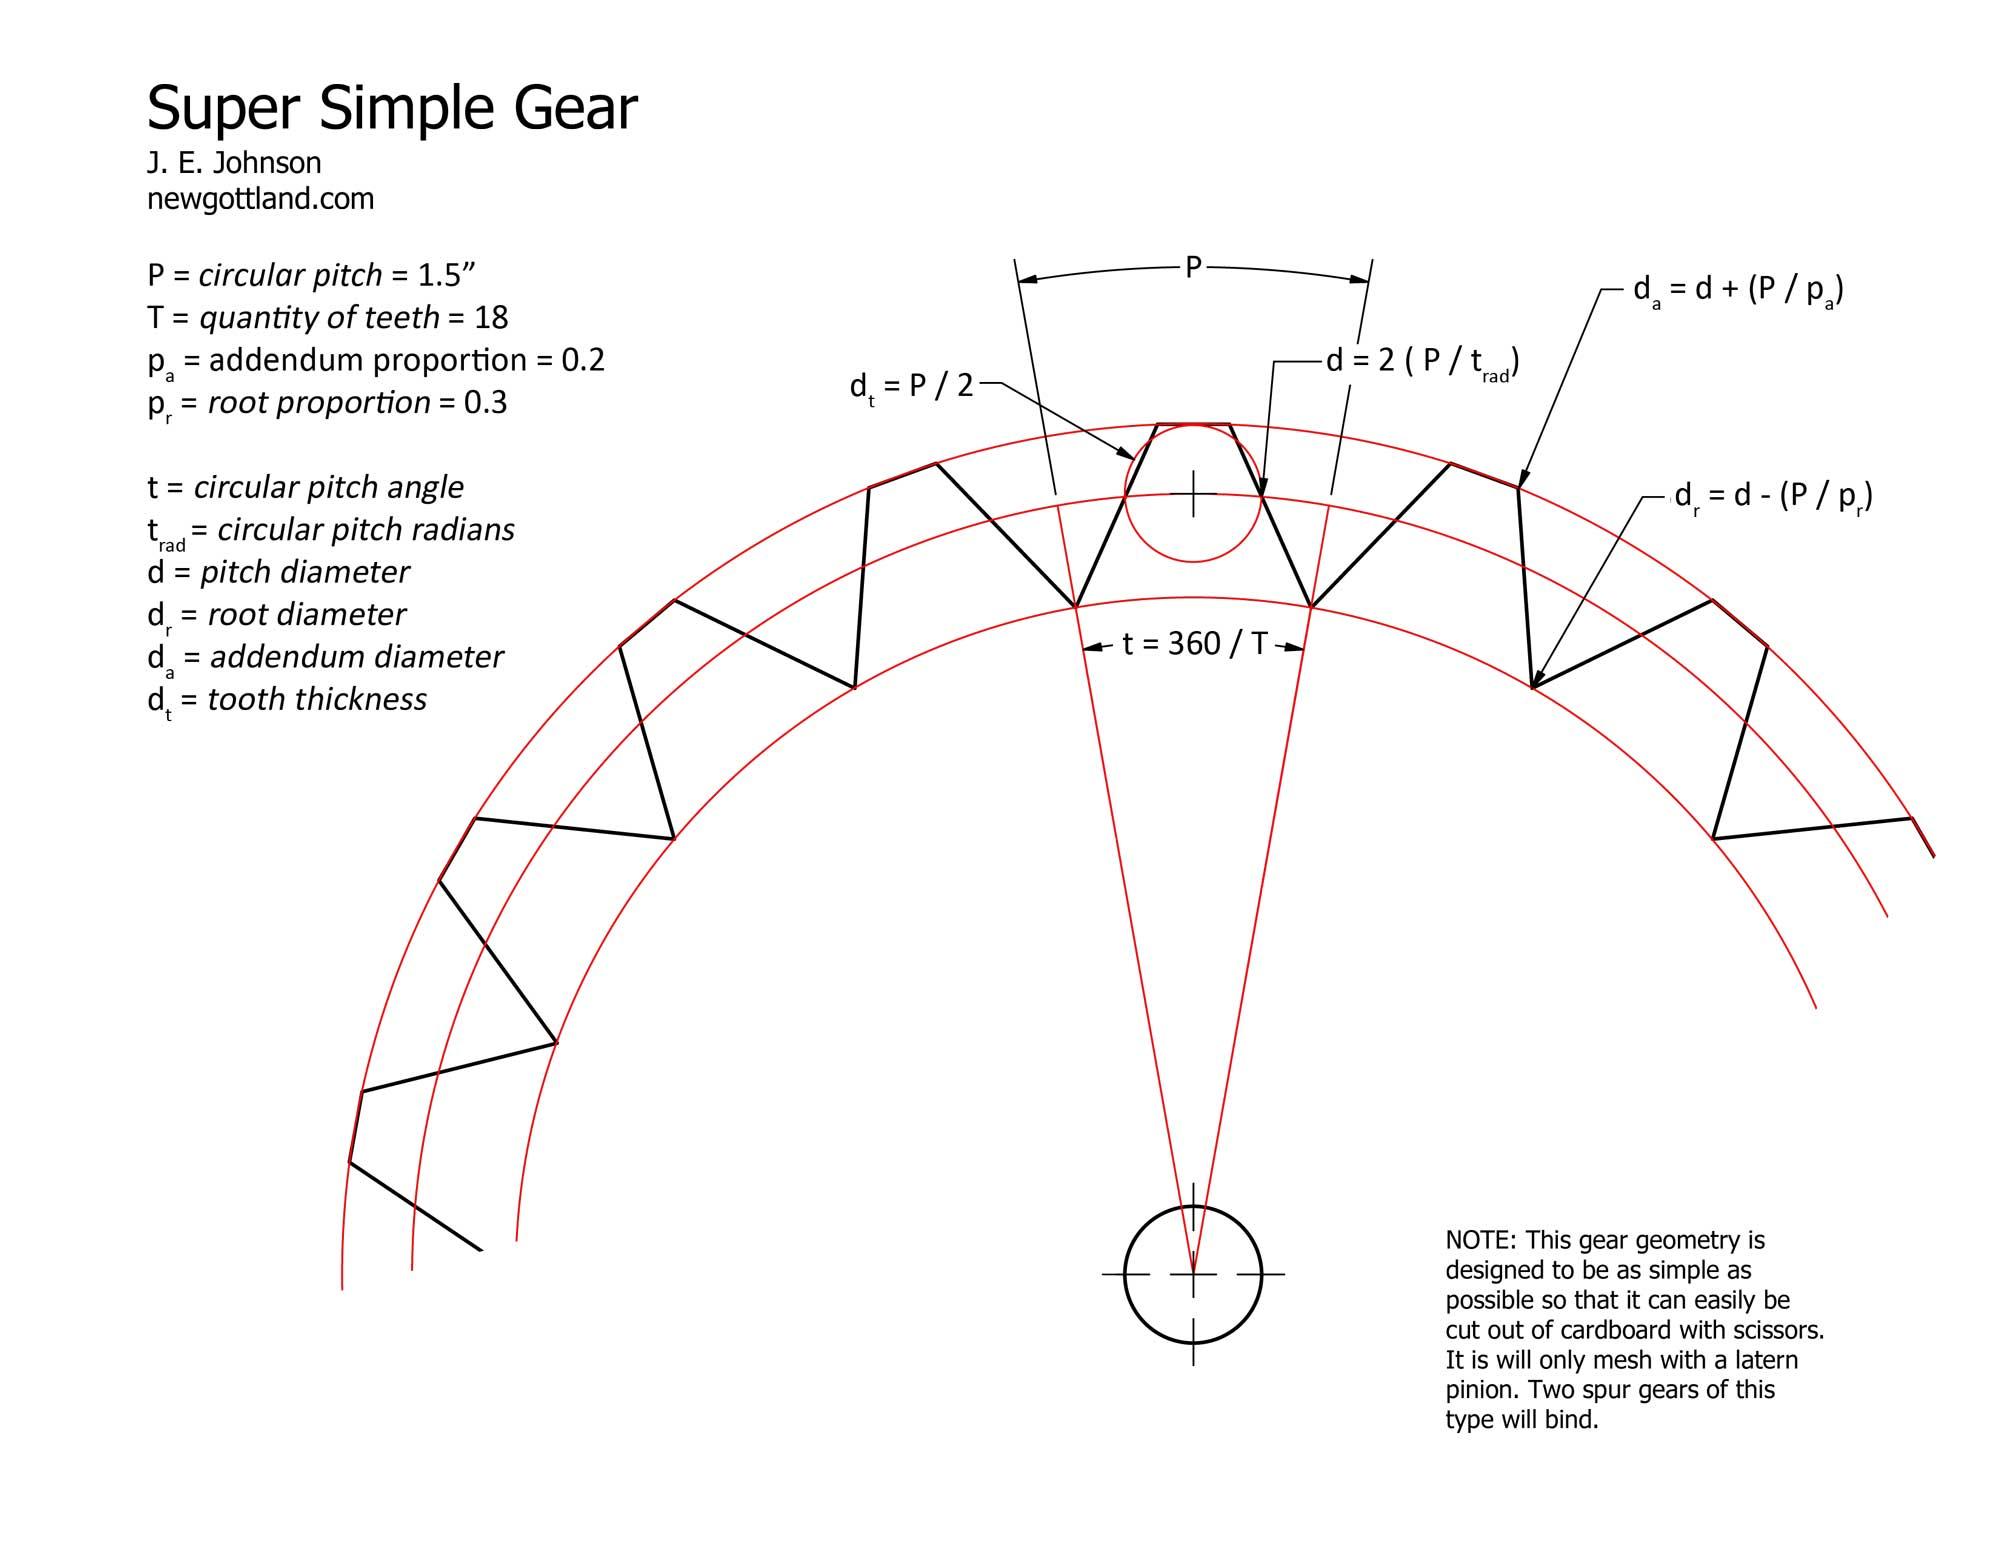 thirdwheel-18t-20130331.jpg